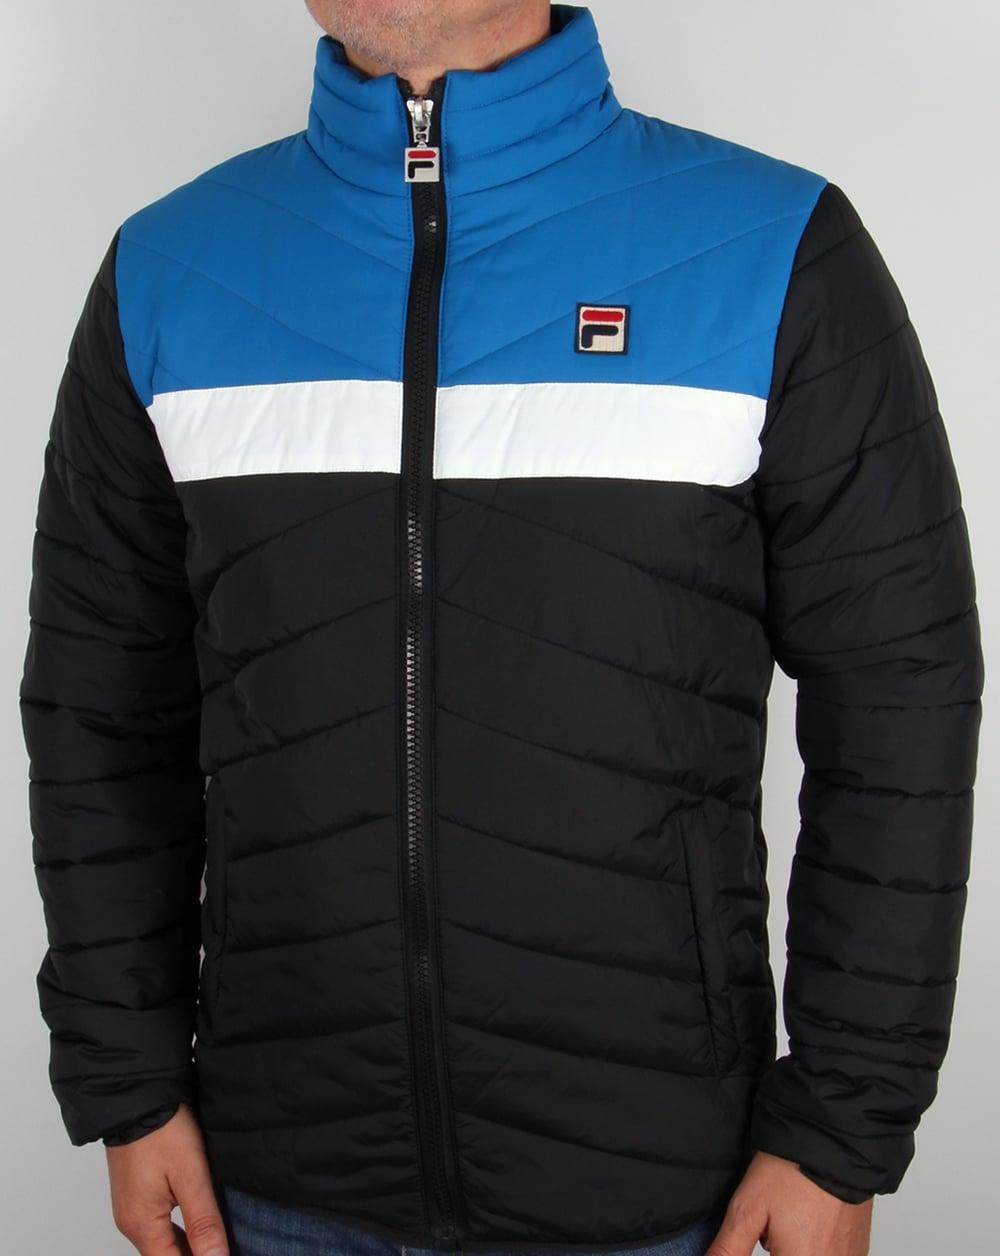 Fila Vintage 80s Ski Jacket Black/Blue